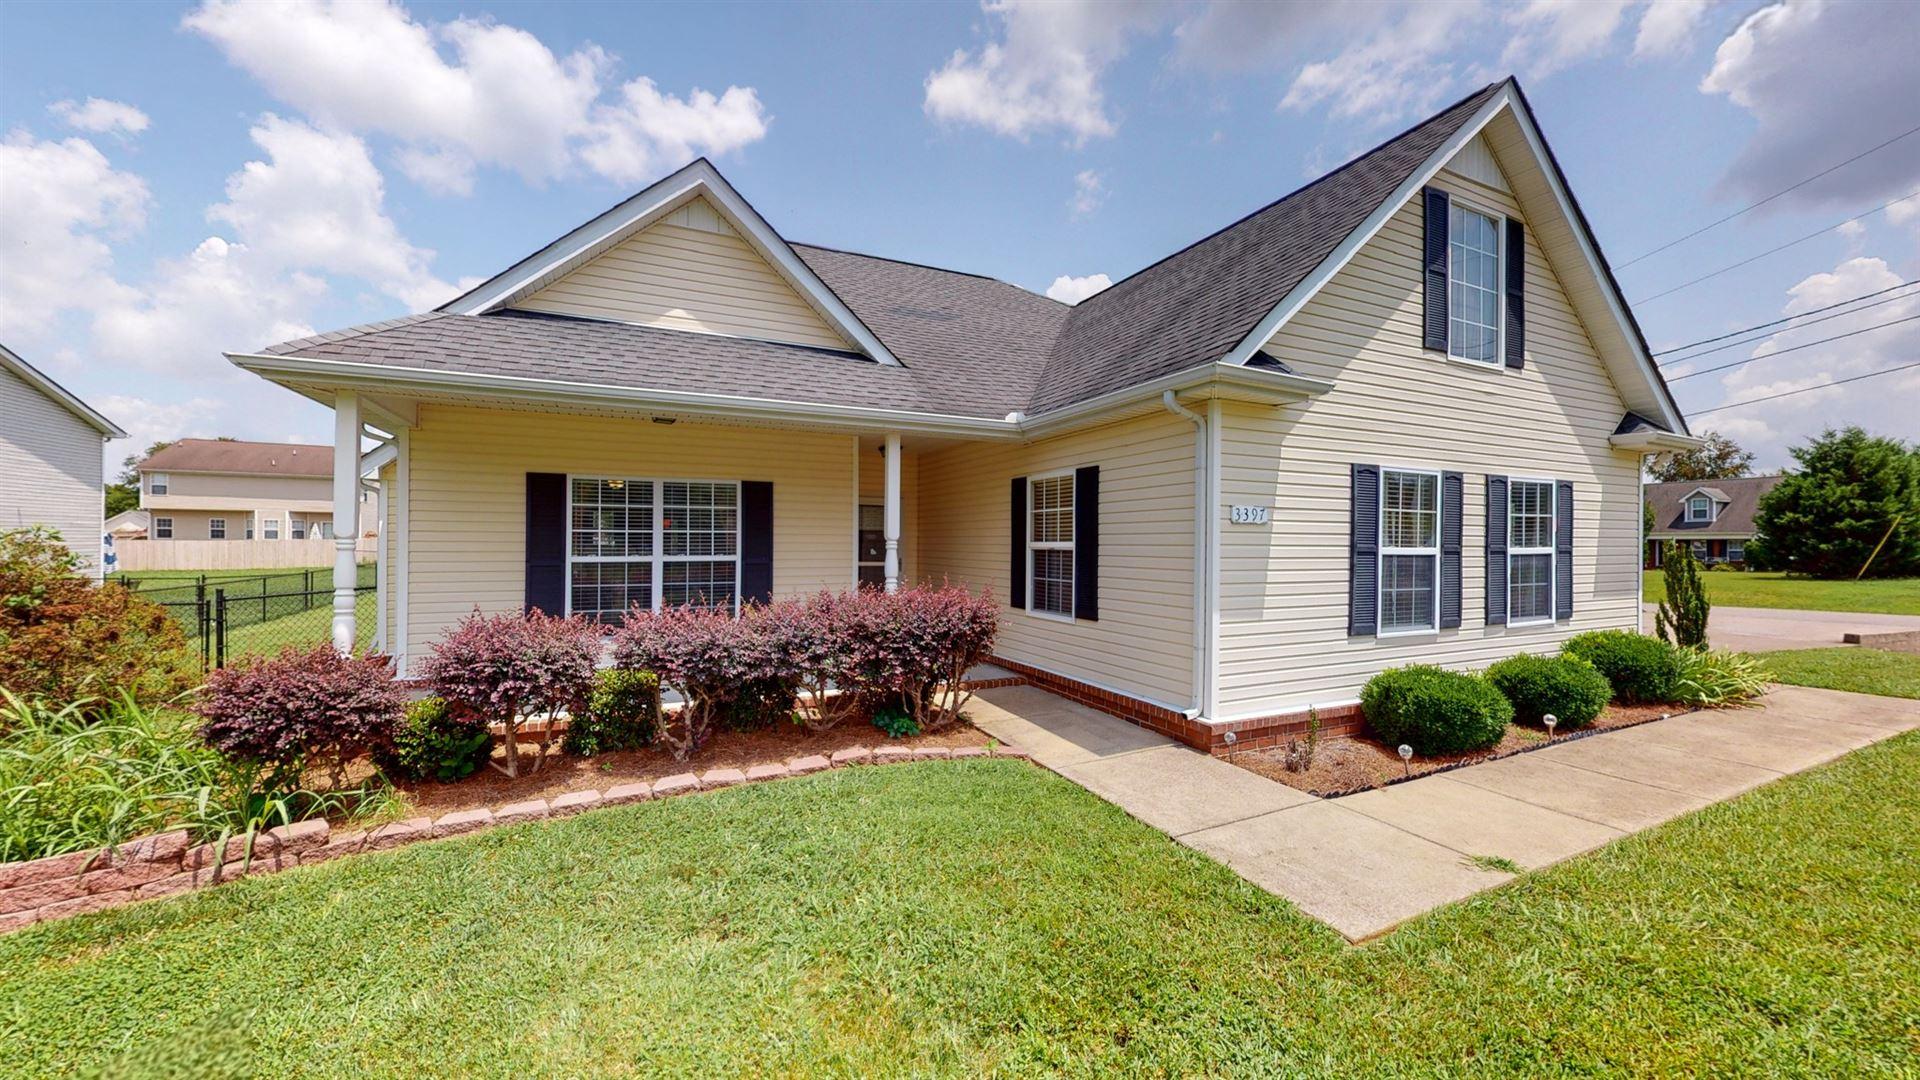 3397 Asbury Ct, Murfreesboro, TN 37127 - MLS#: 2275015